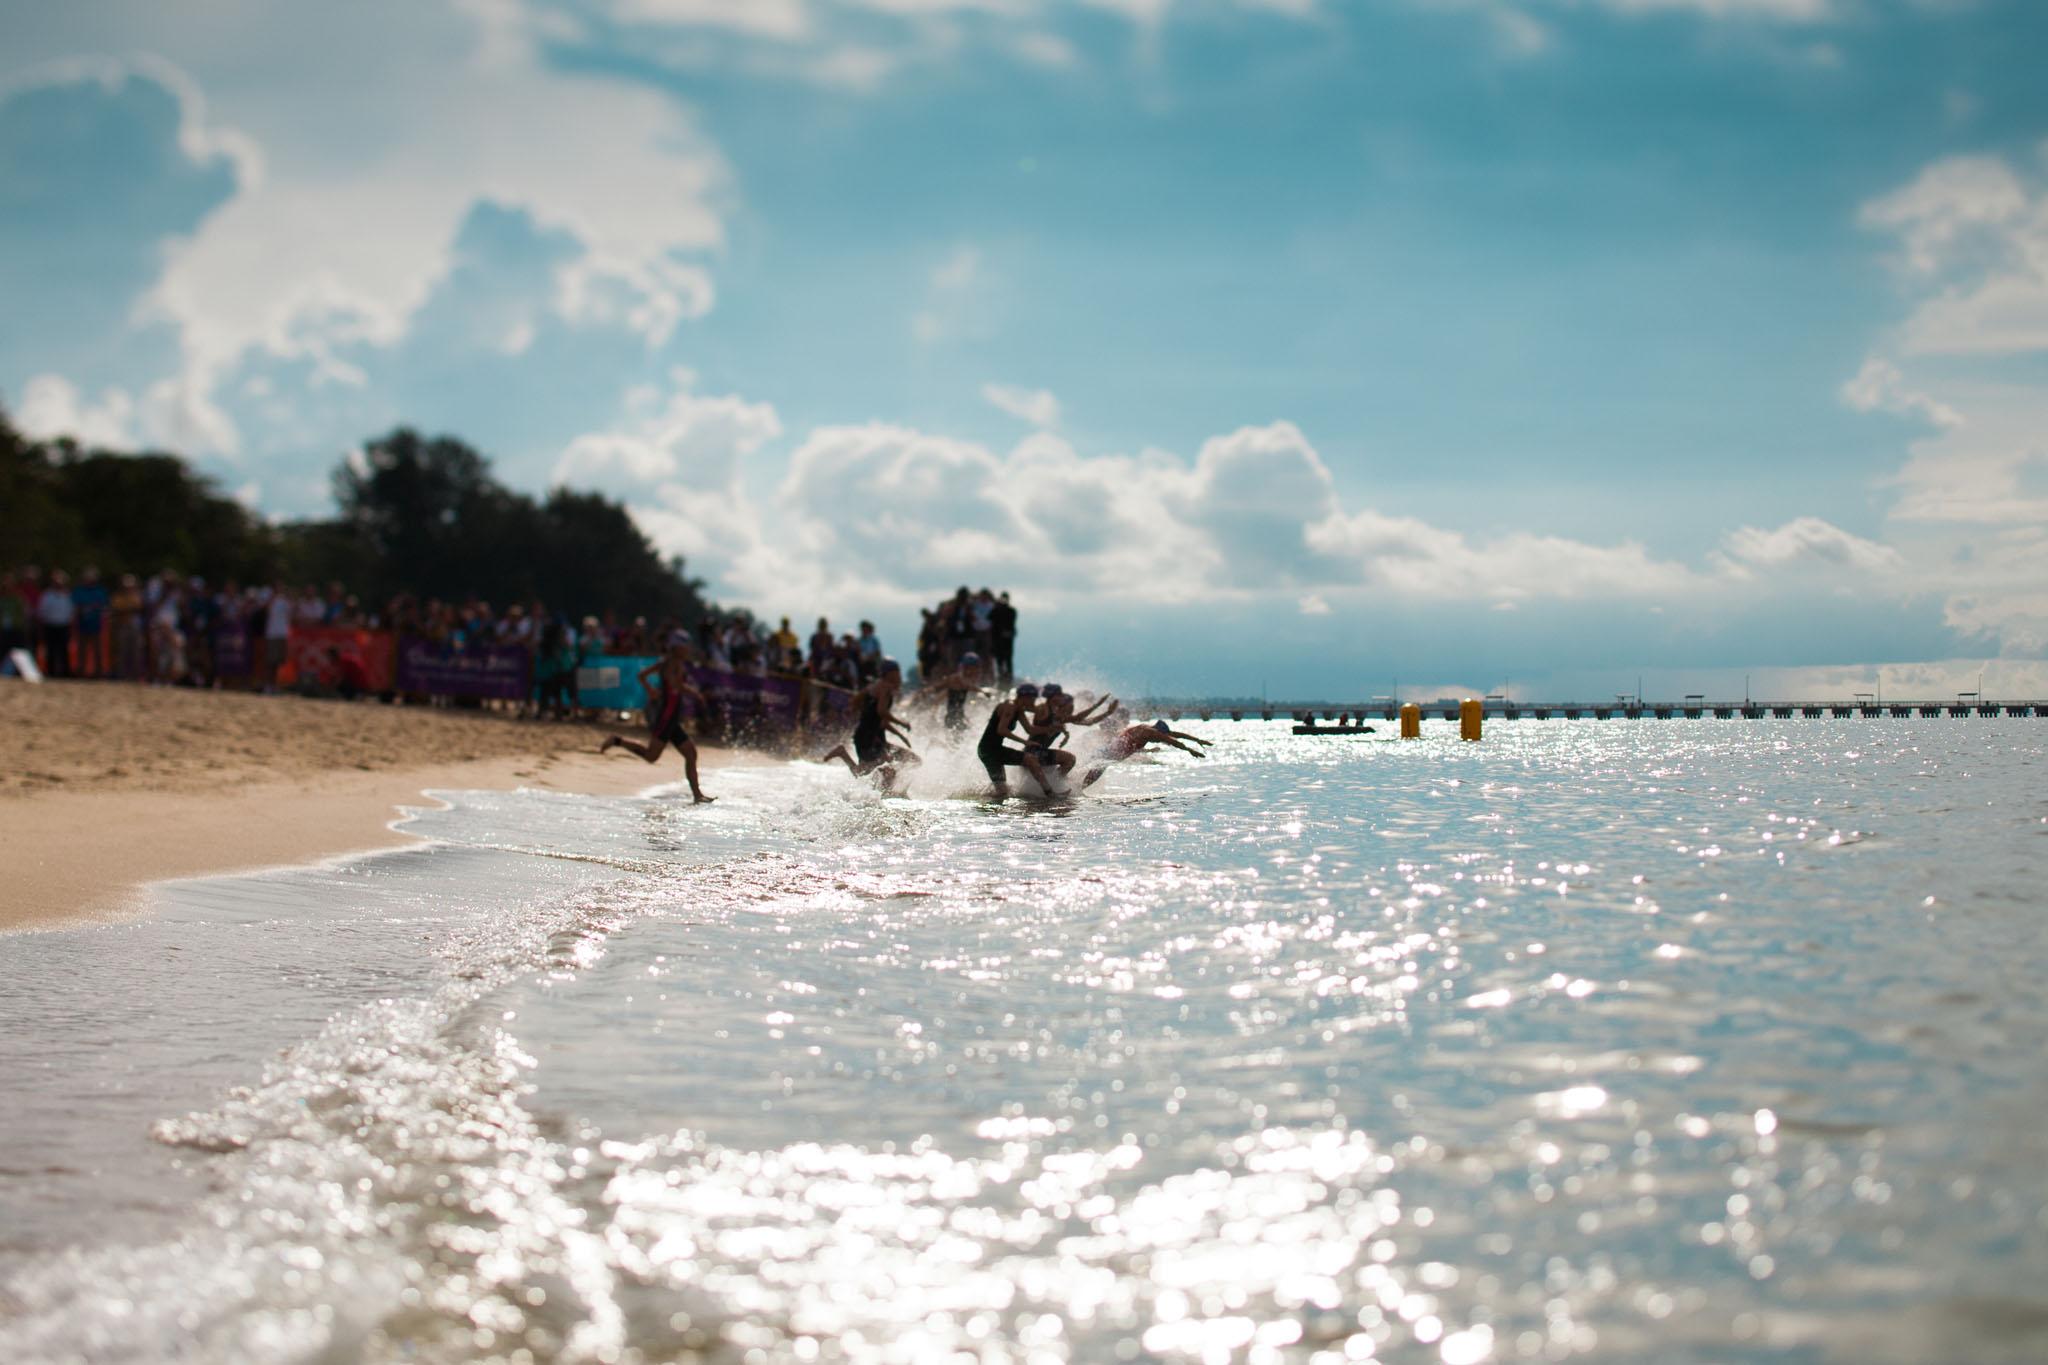 singapore-commercial-photographer-editorial-documentary-tiltshift-yog-olympic-games-olympics-zakaria-zainal-08.jpg